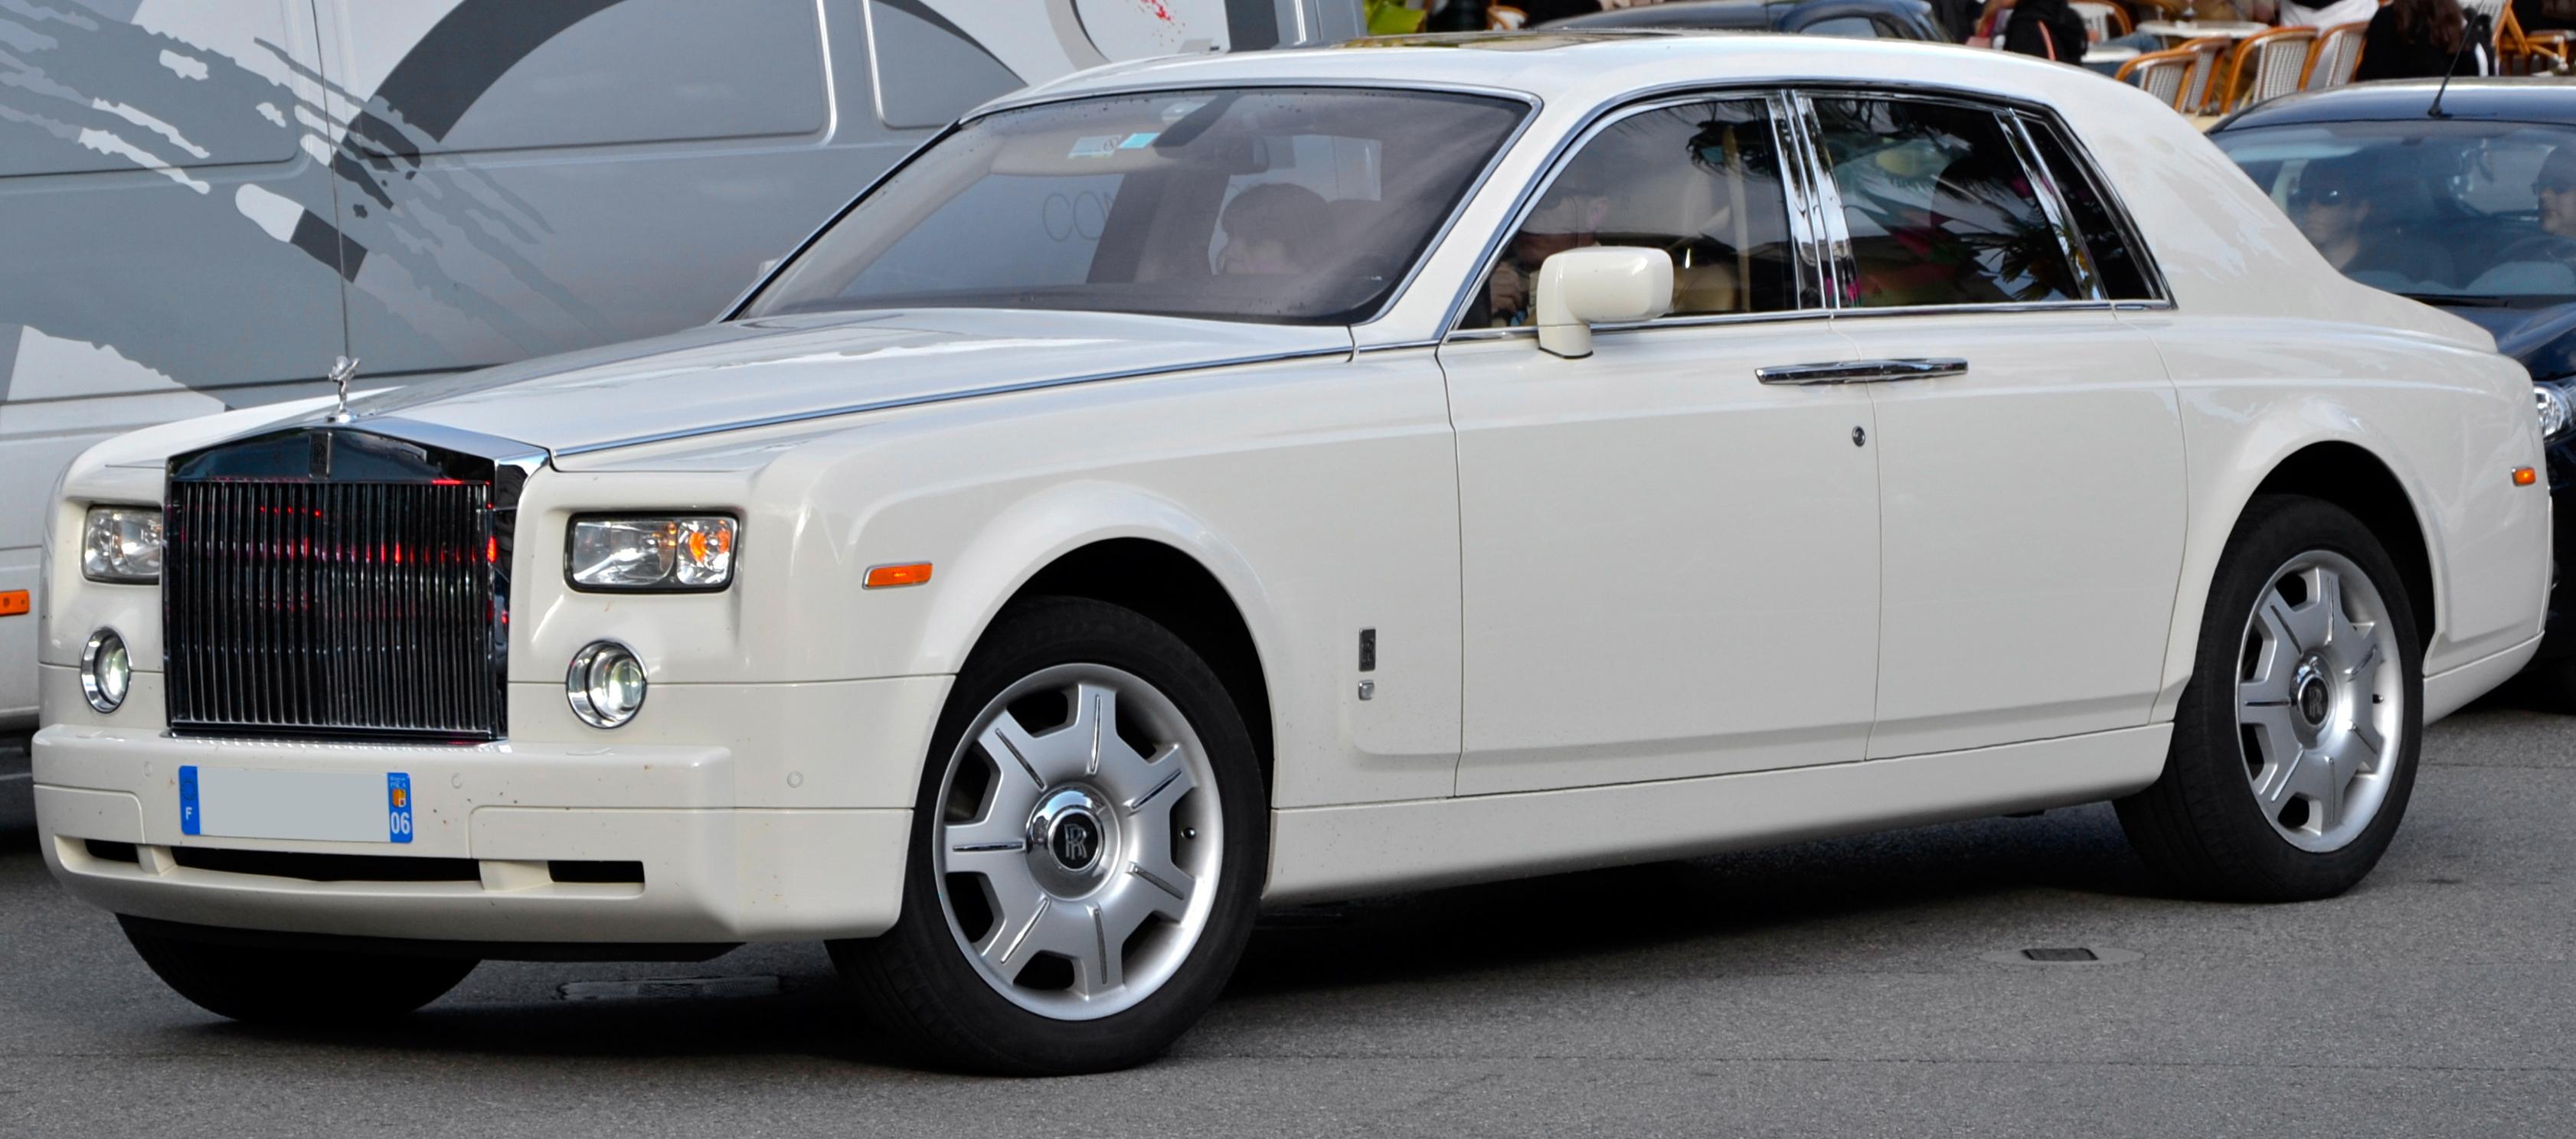 Rolls Royce Phantom Vii Wikiwand